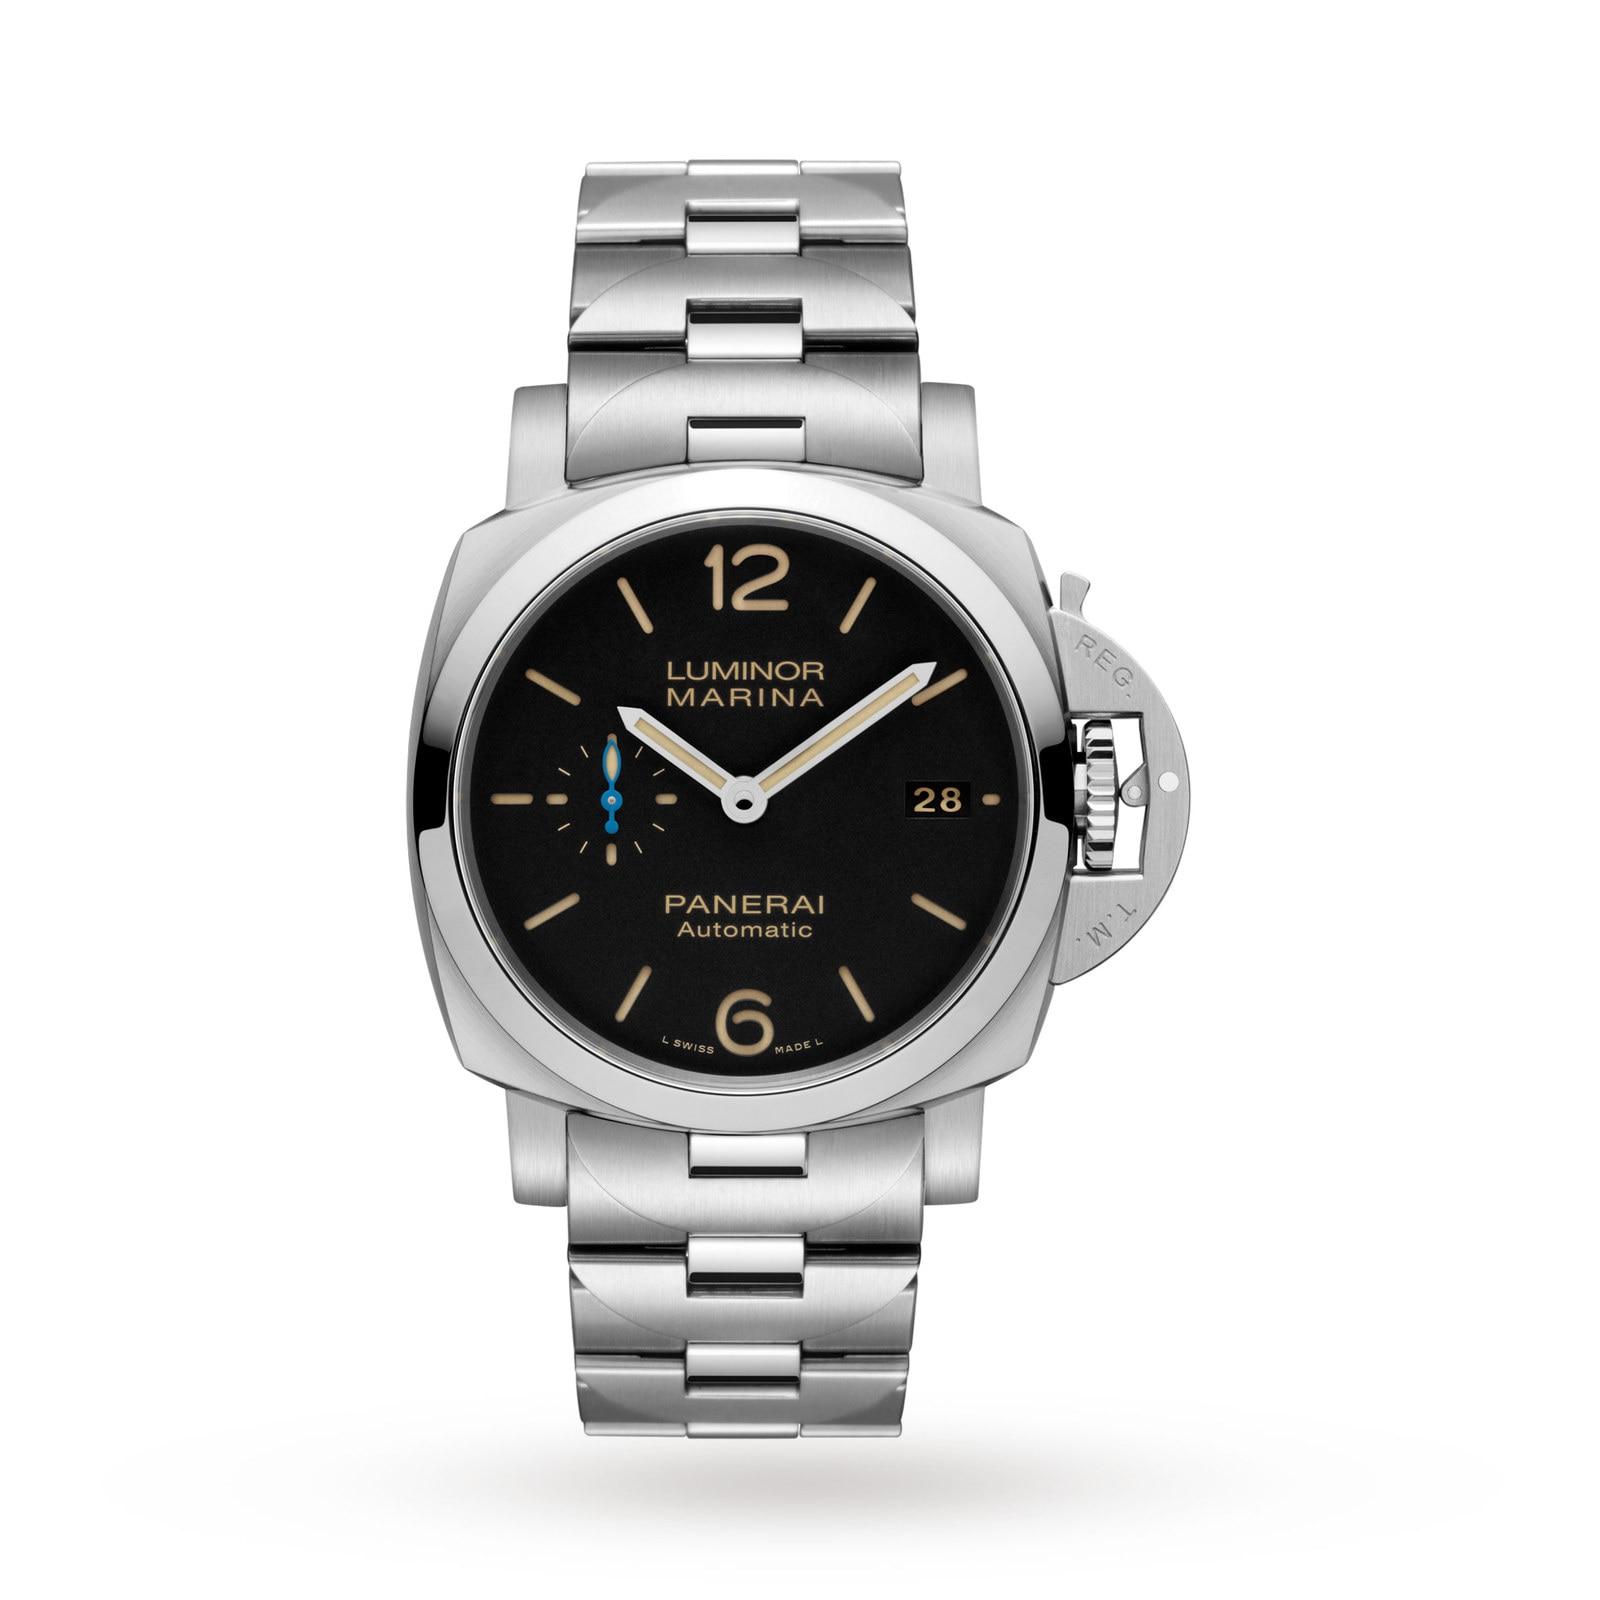 Panerai Luminor Marina 1950 3 Days Automatic Acciaio Mens Watches